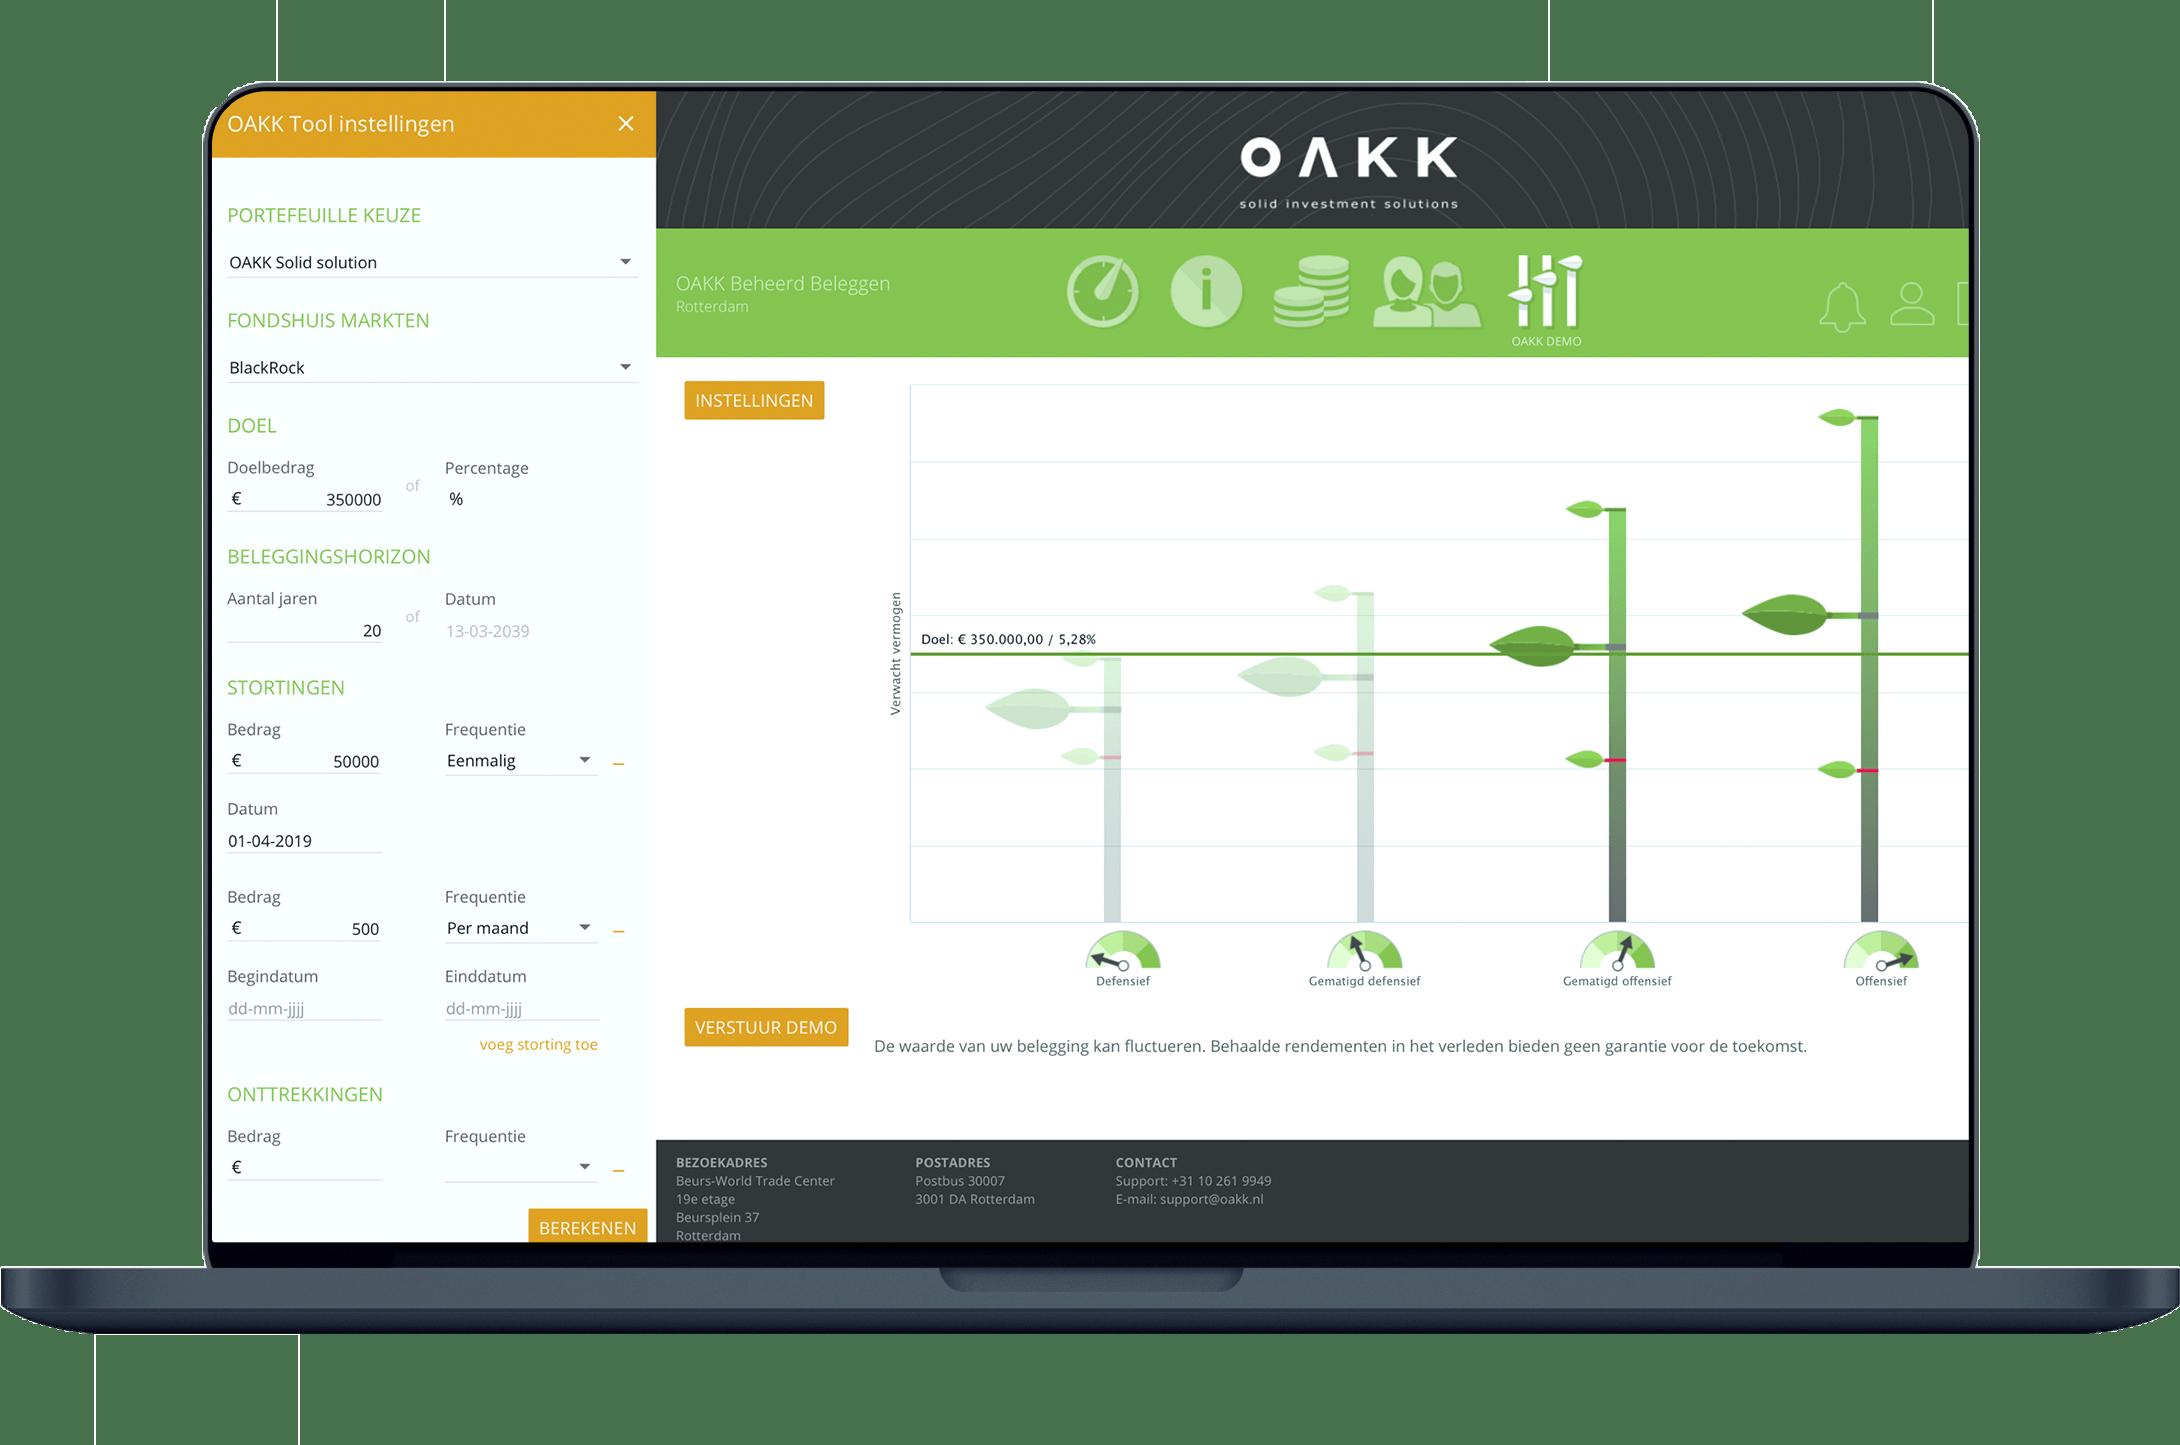 OAKK KWARTAALVERSLAG Q3 2020